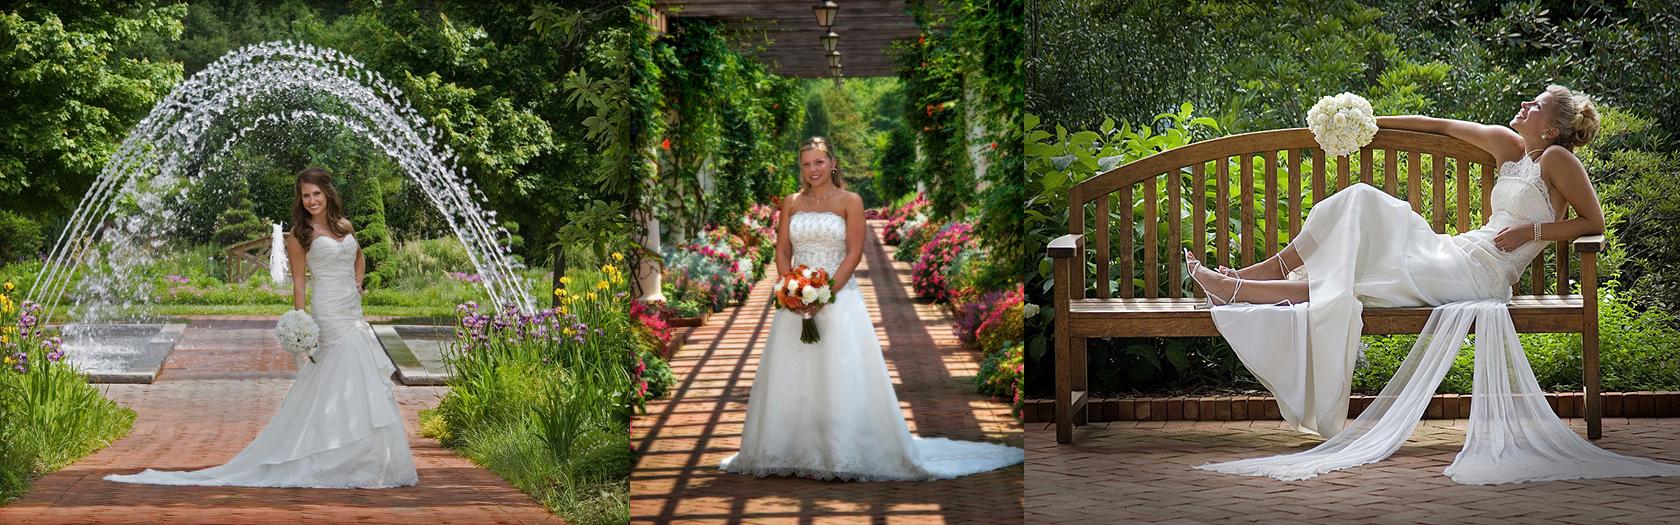 bridal_slider_outdoor